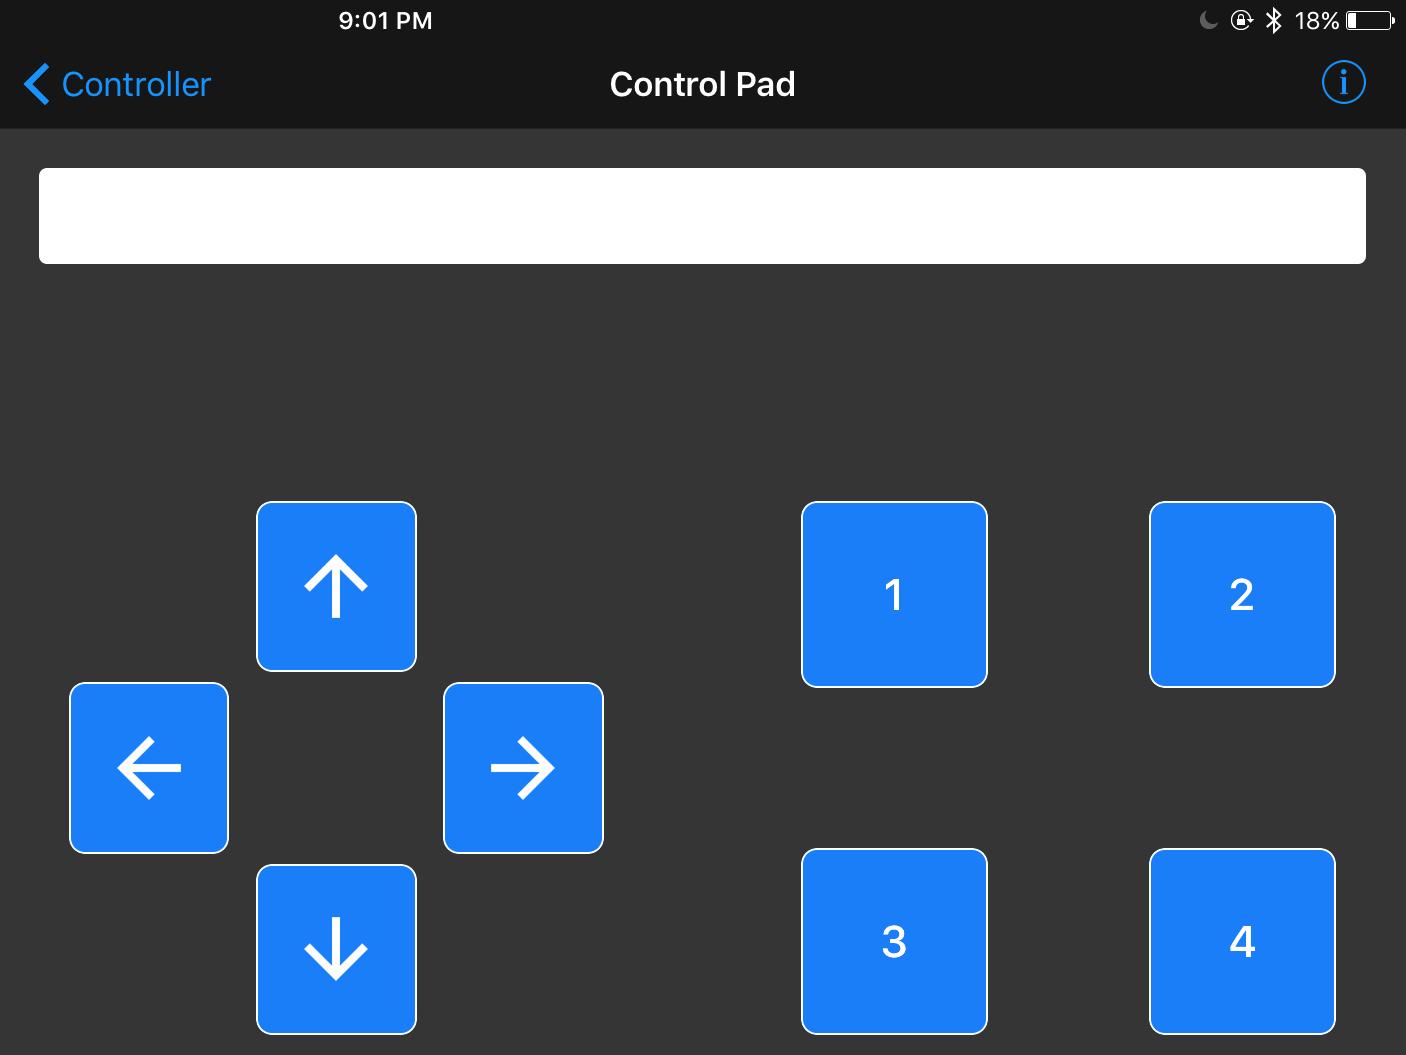 microcomputers_controlpad.png